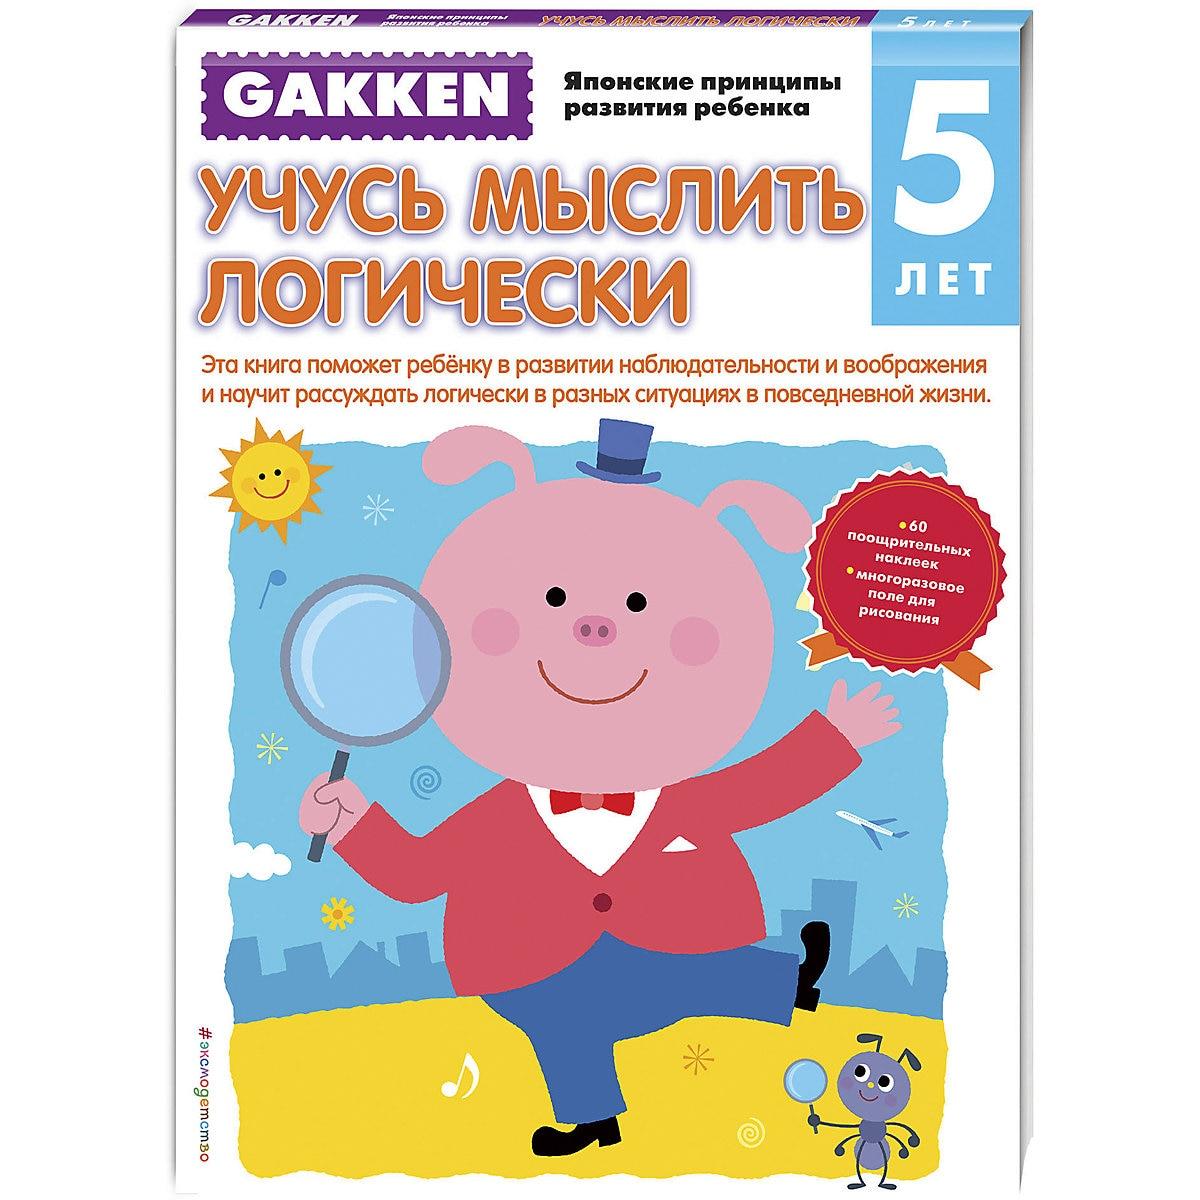 Books EKSMO 6878129 Children Education Encyclopedia Alphabet Dictionary Book For Baby MTpromo